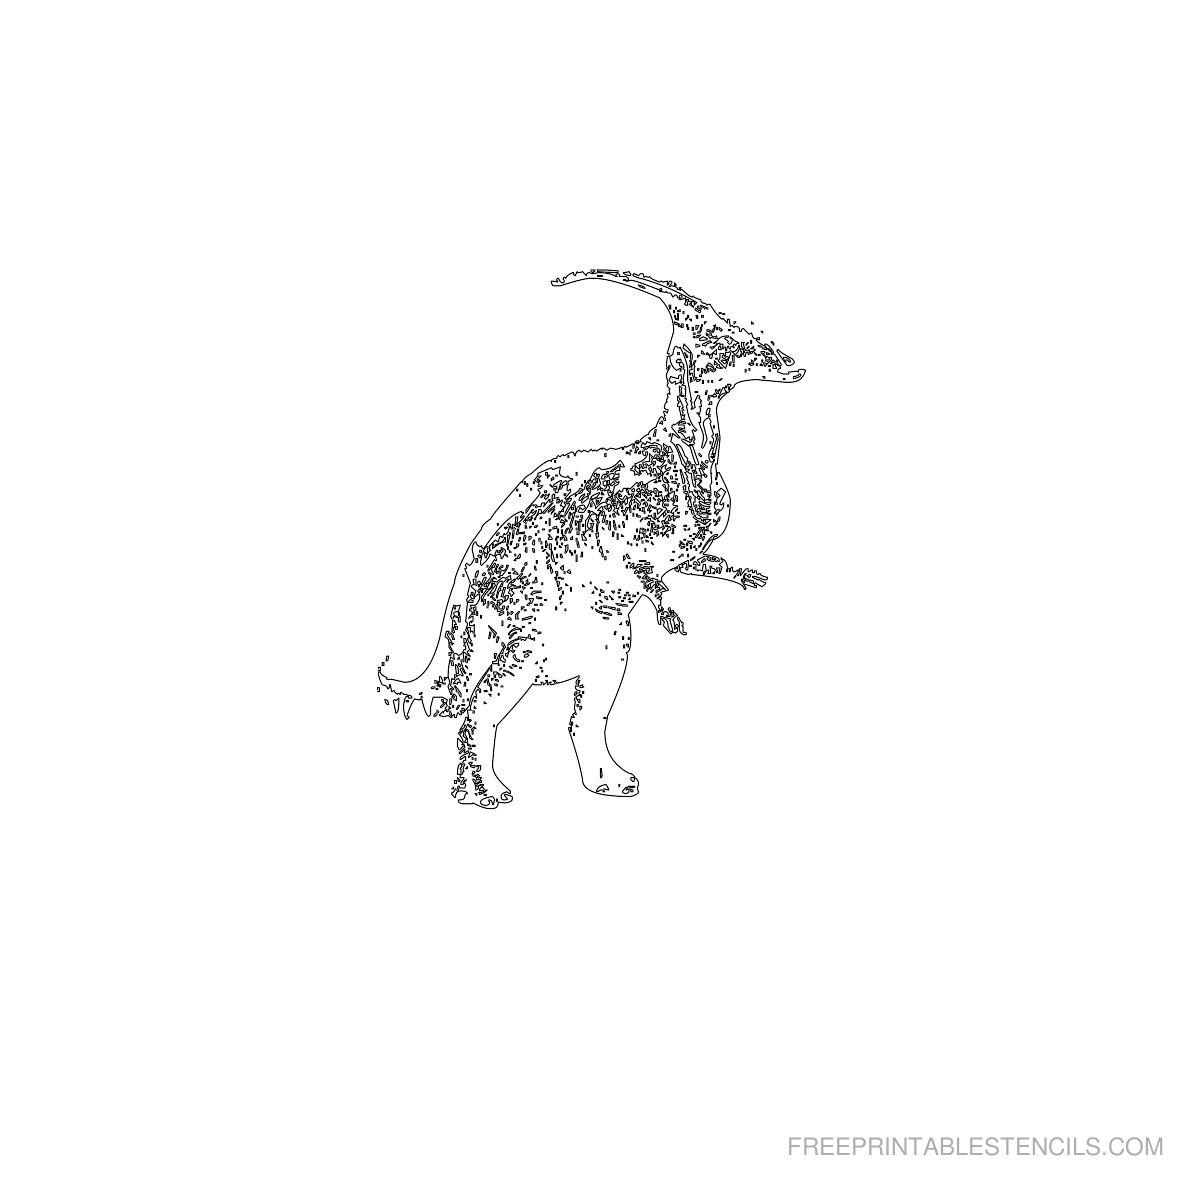 Free Printable Dinosaur Stencil R